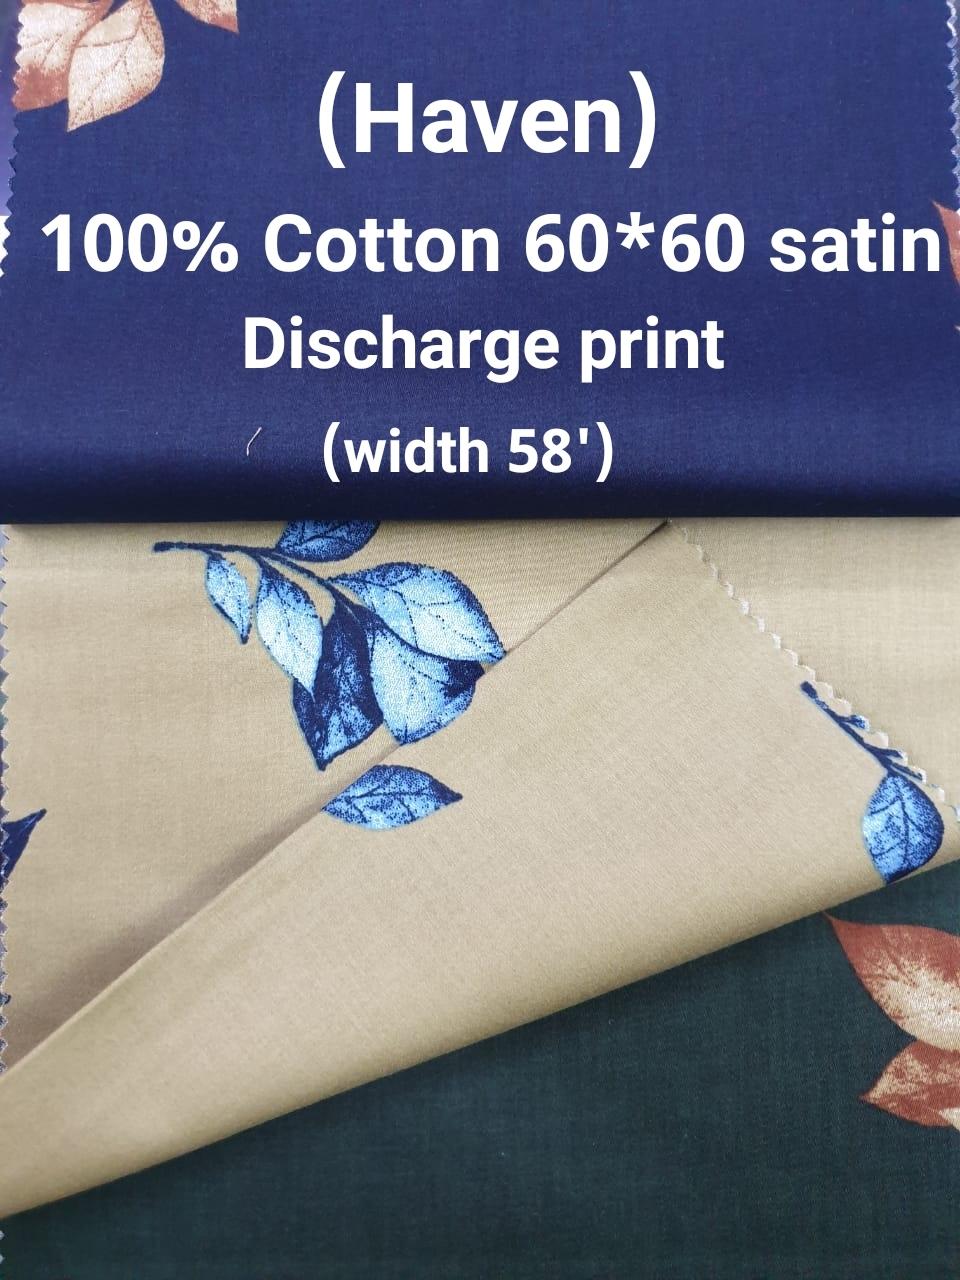 (HAVEN) 100% cotton 60*60 satin discharge print